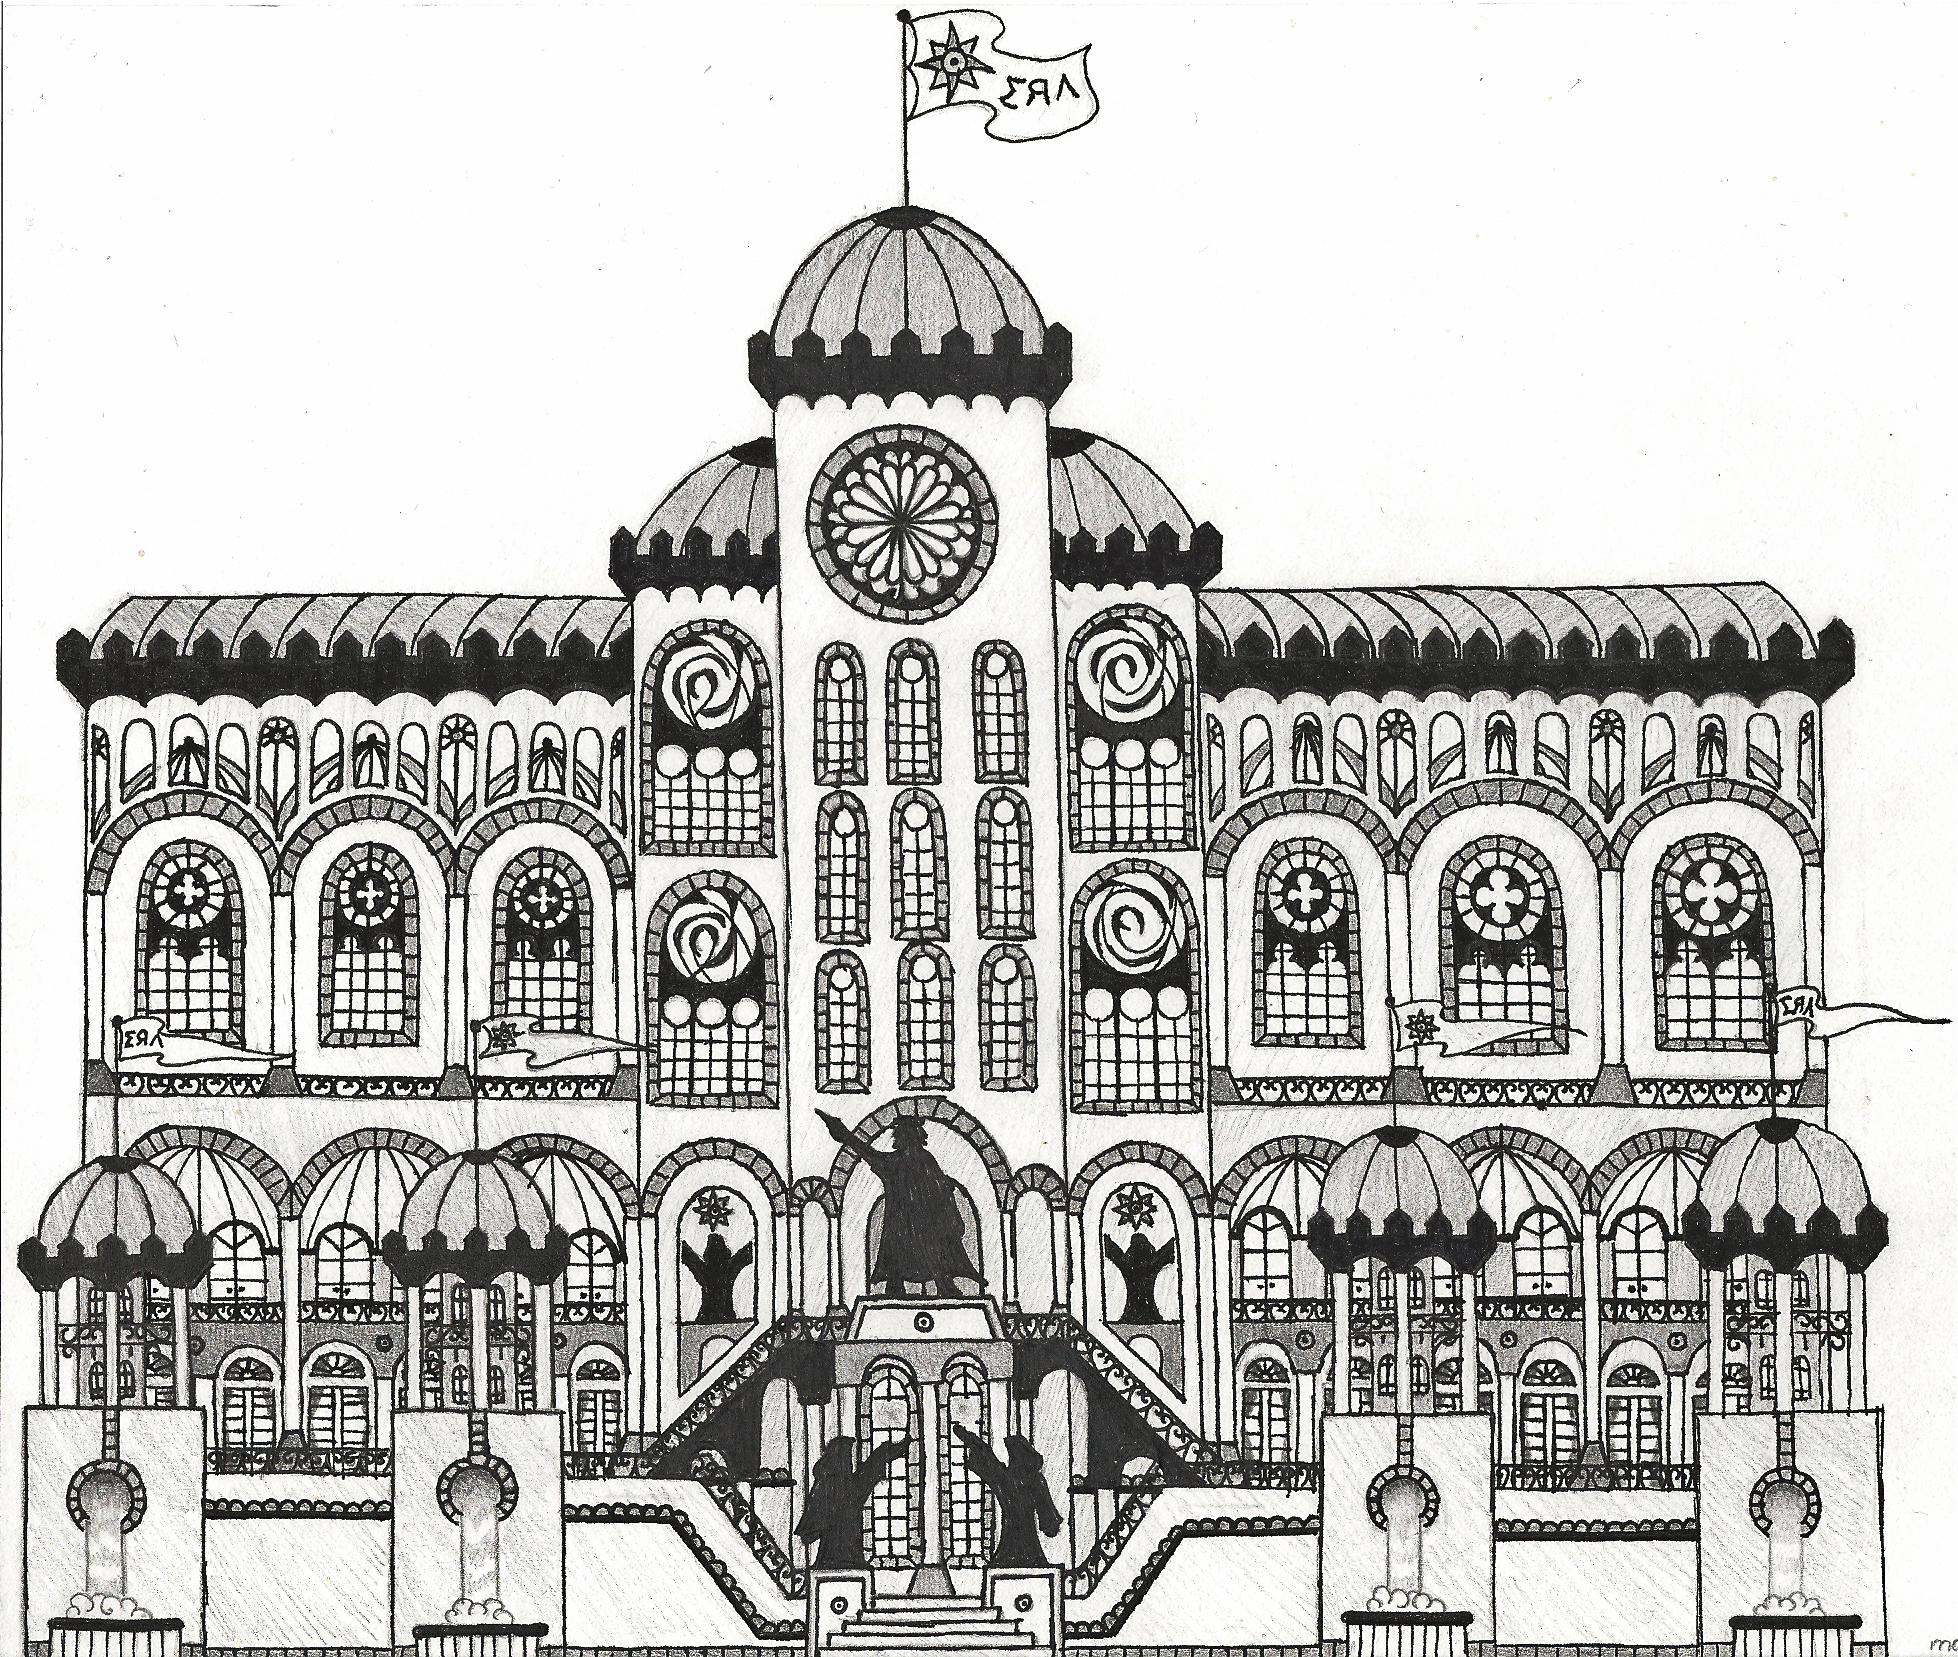 Magatia royal palace by InryDanmaku on DeviantArt